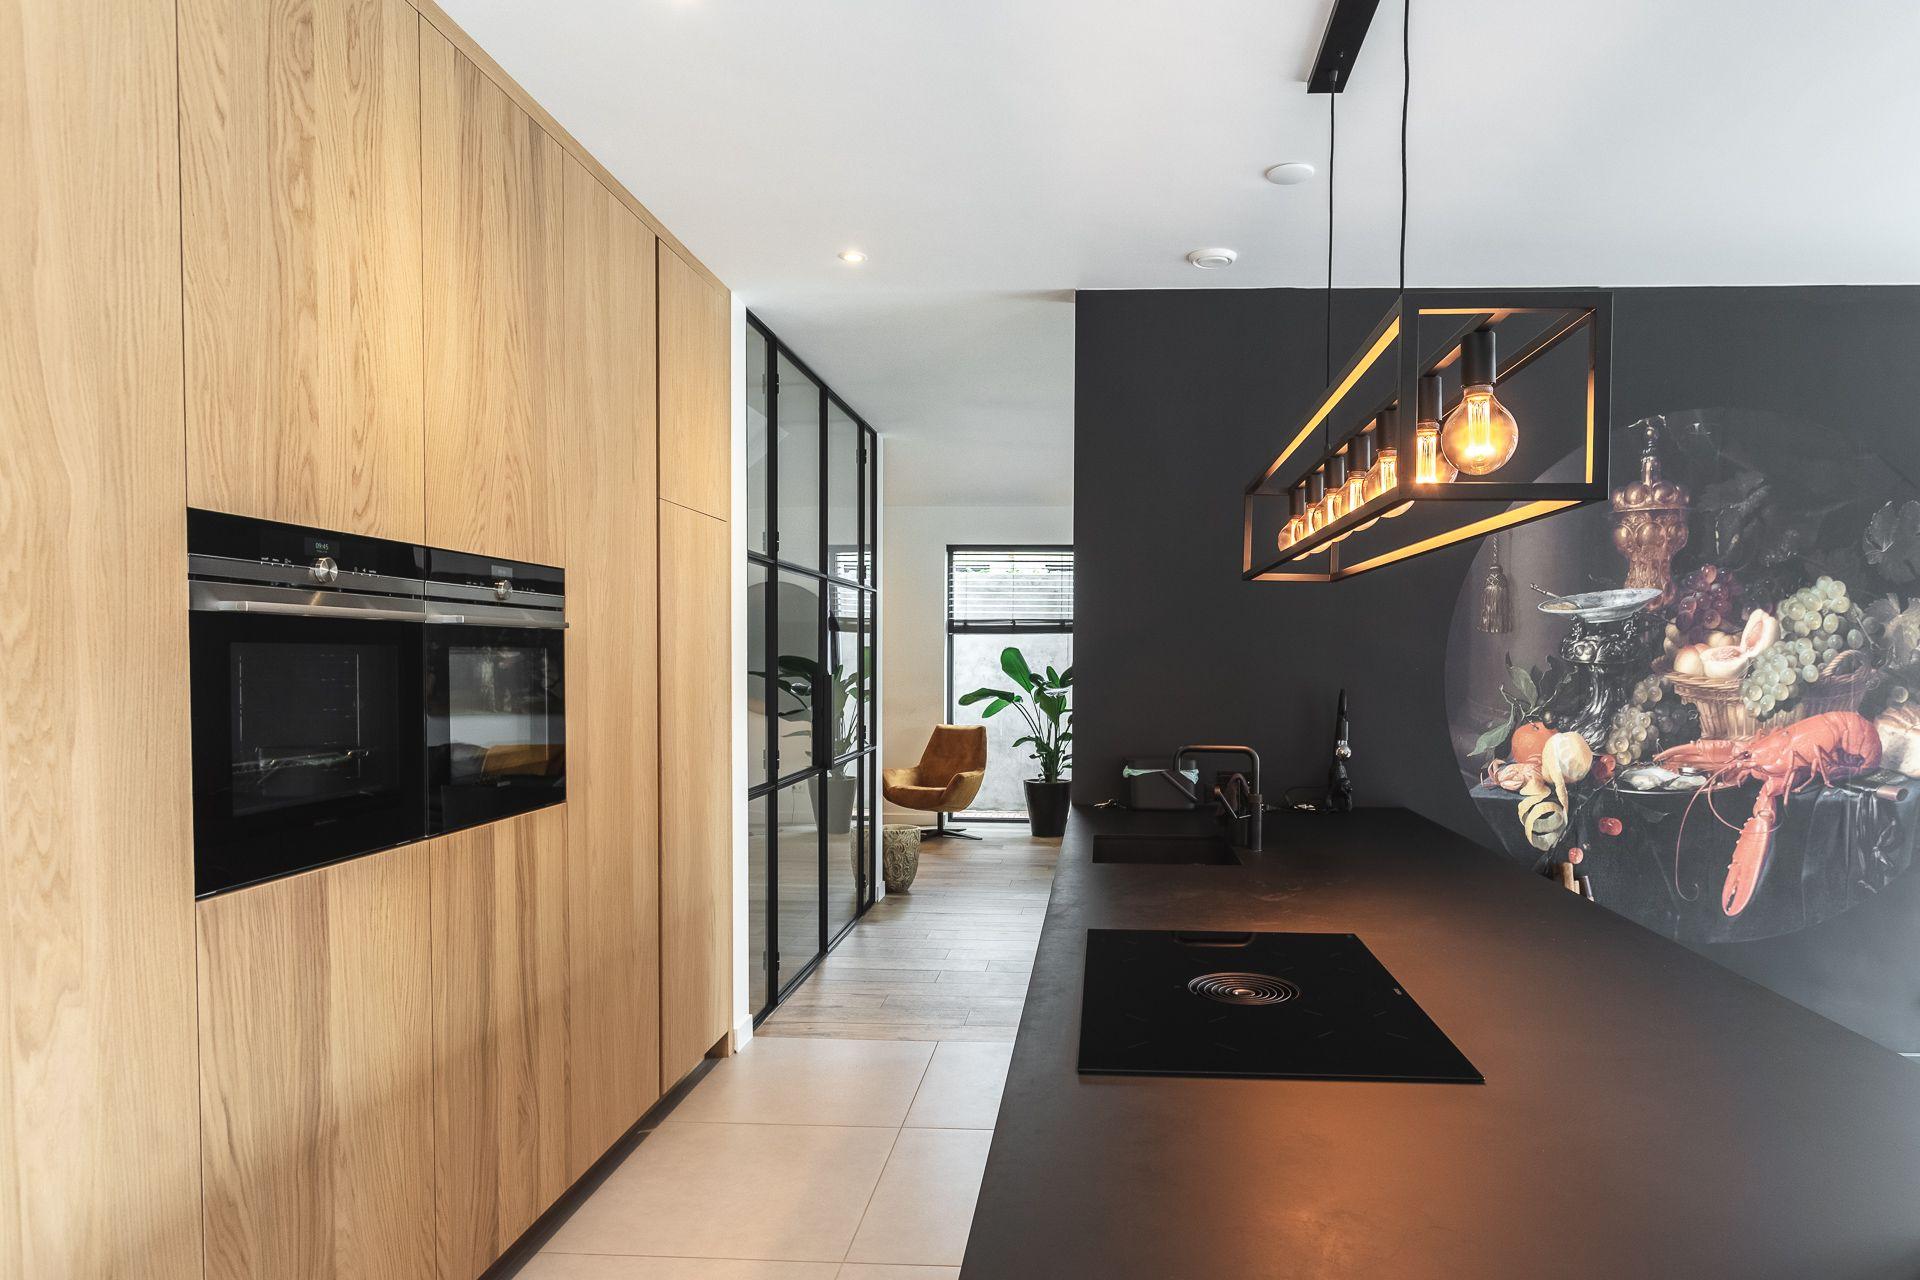 Keuken In 2020 Interieur Design Keuken